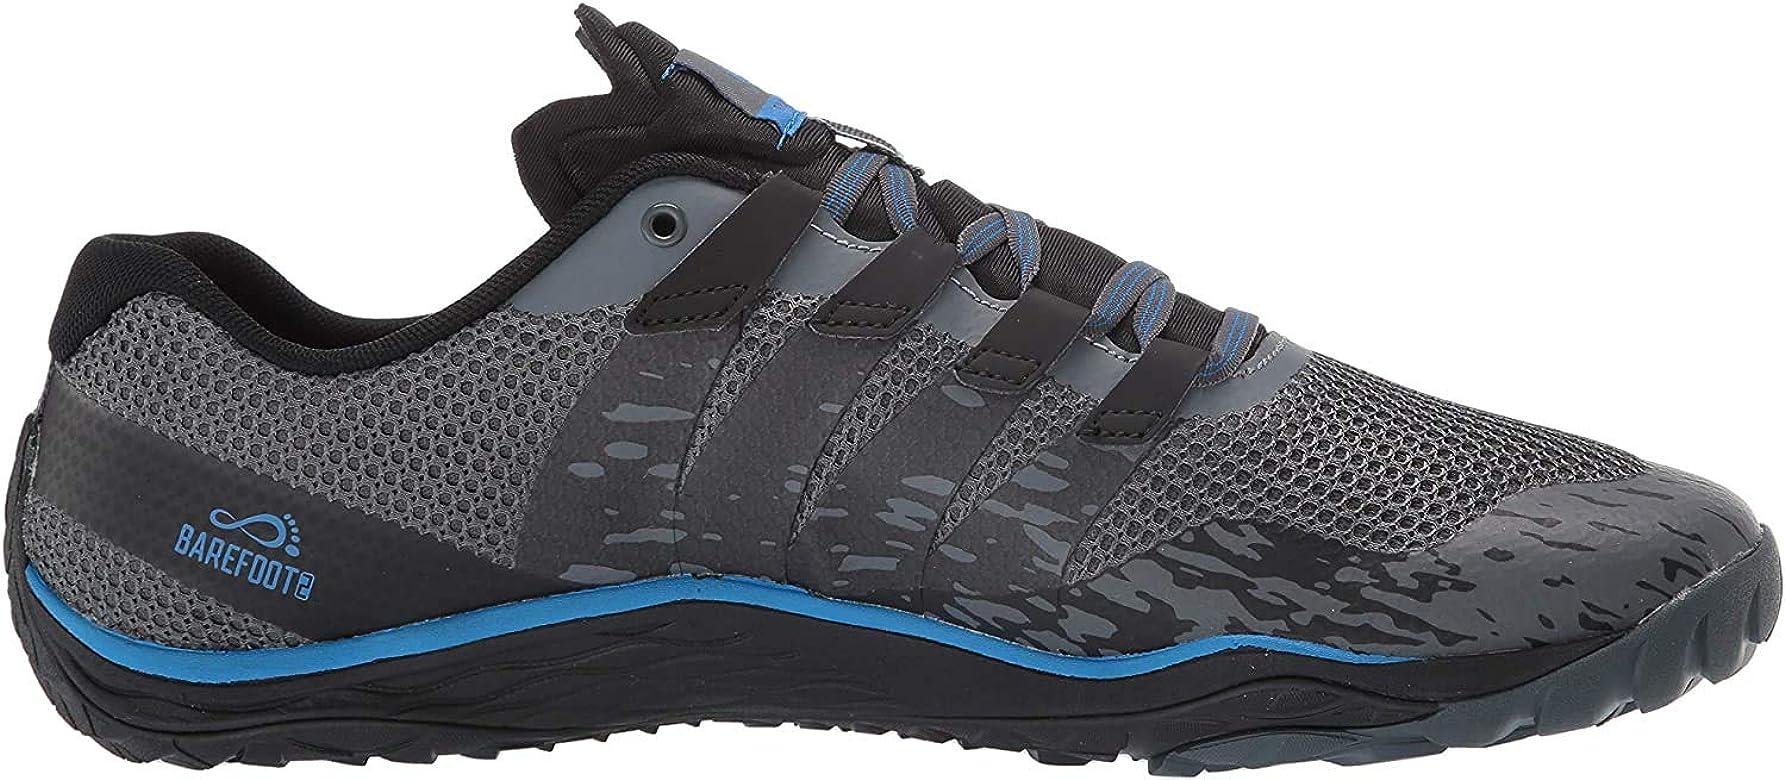 Merrell Trail Glove 5 – Zapatillas, Azul (Turbulence), 40 EU ...